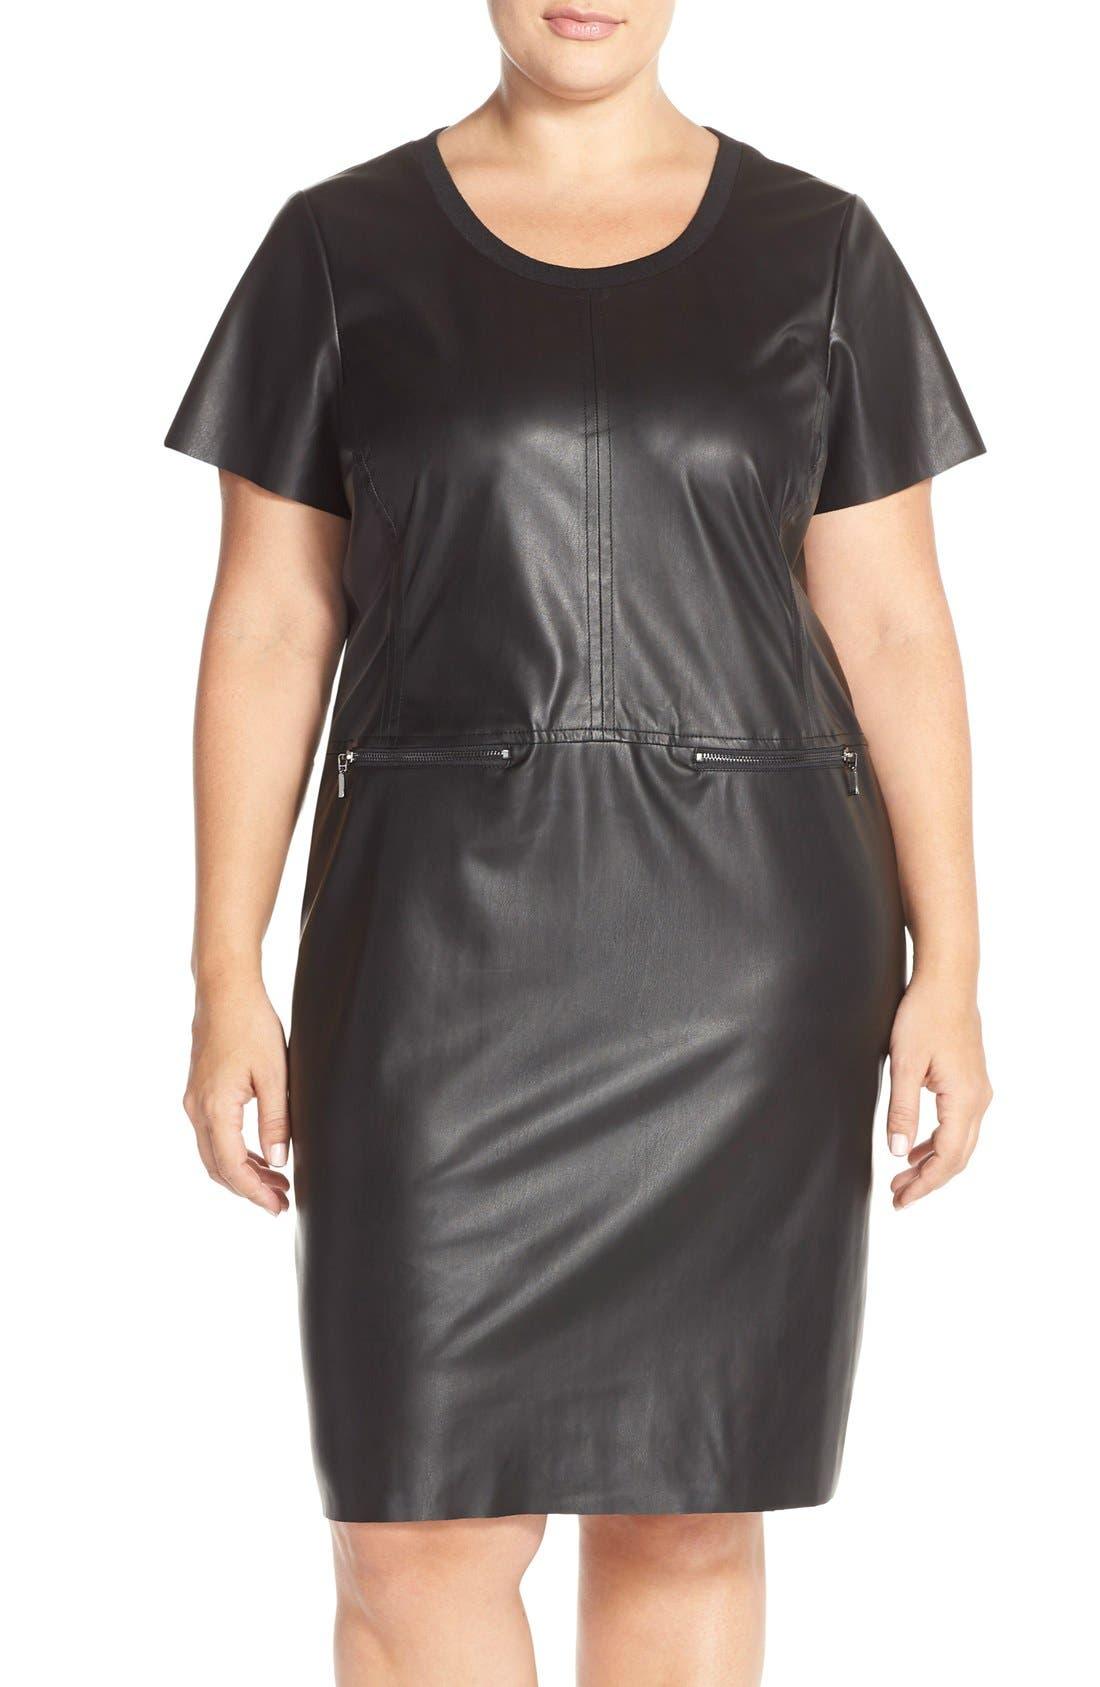 JUNAROSE 'Kanya' Faux Leather Shift Dress, Main, color, 001